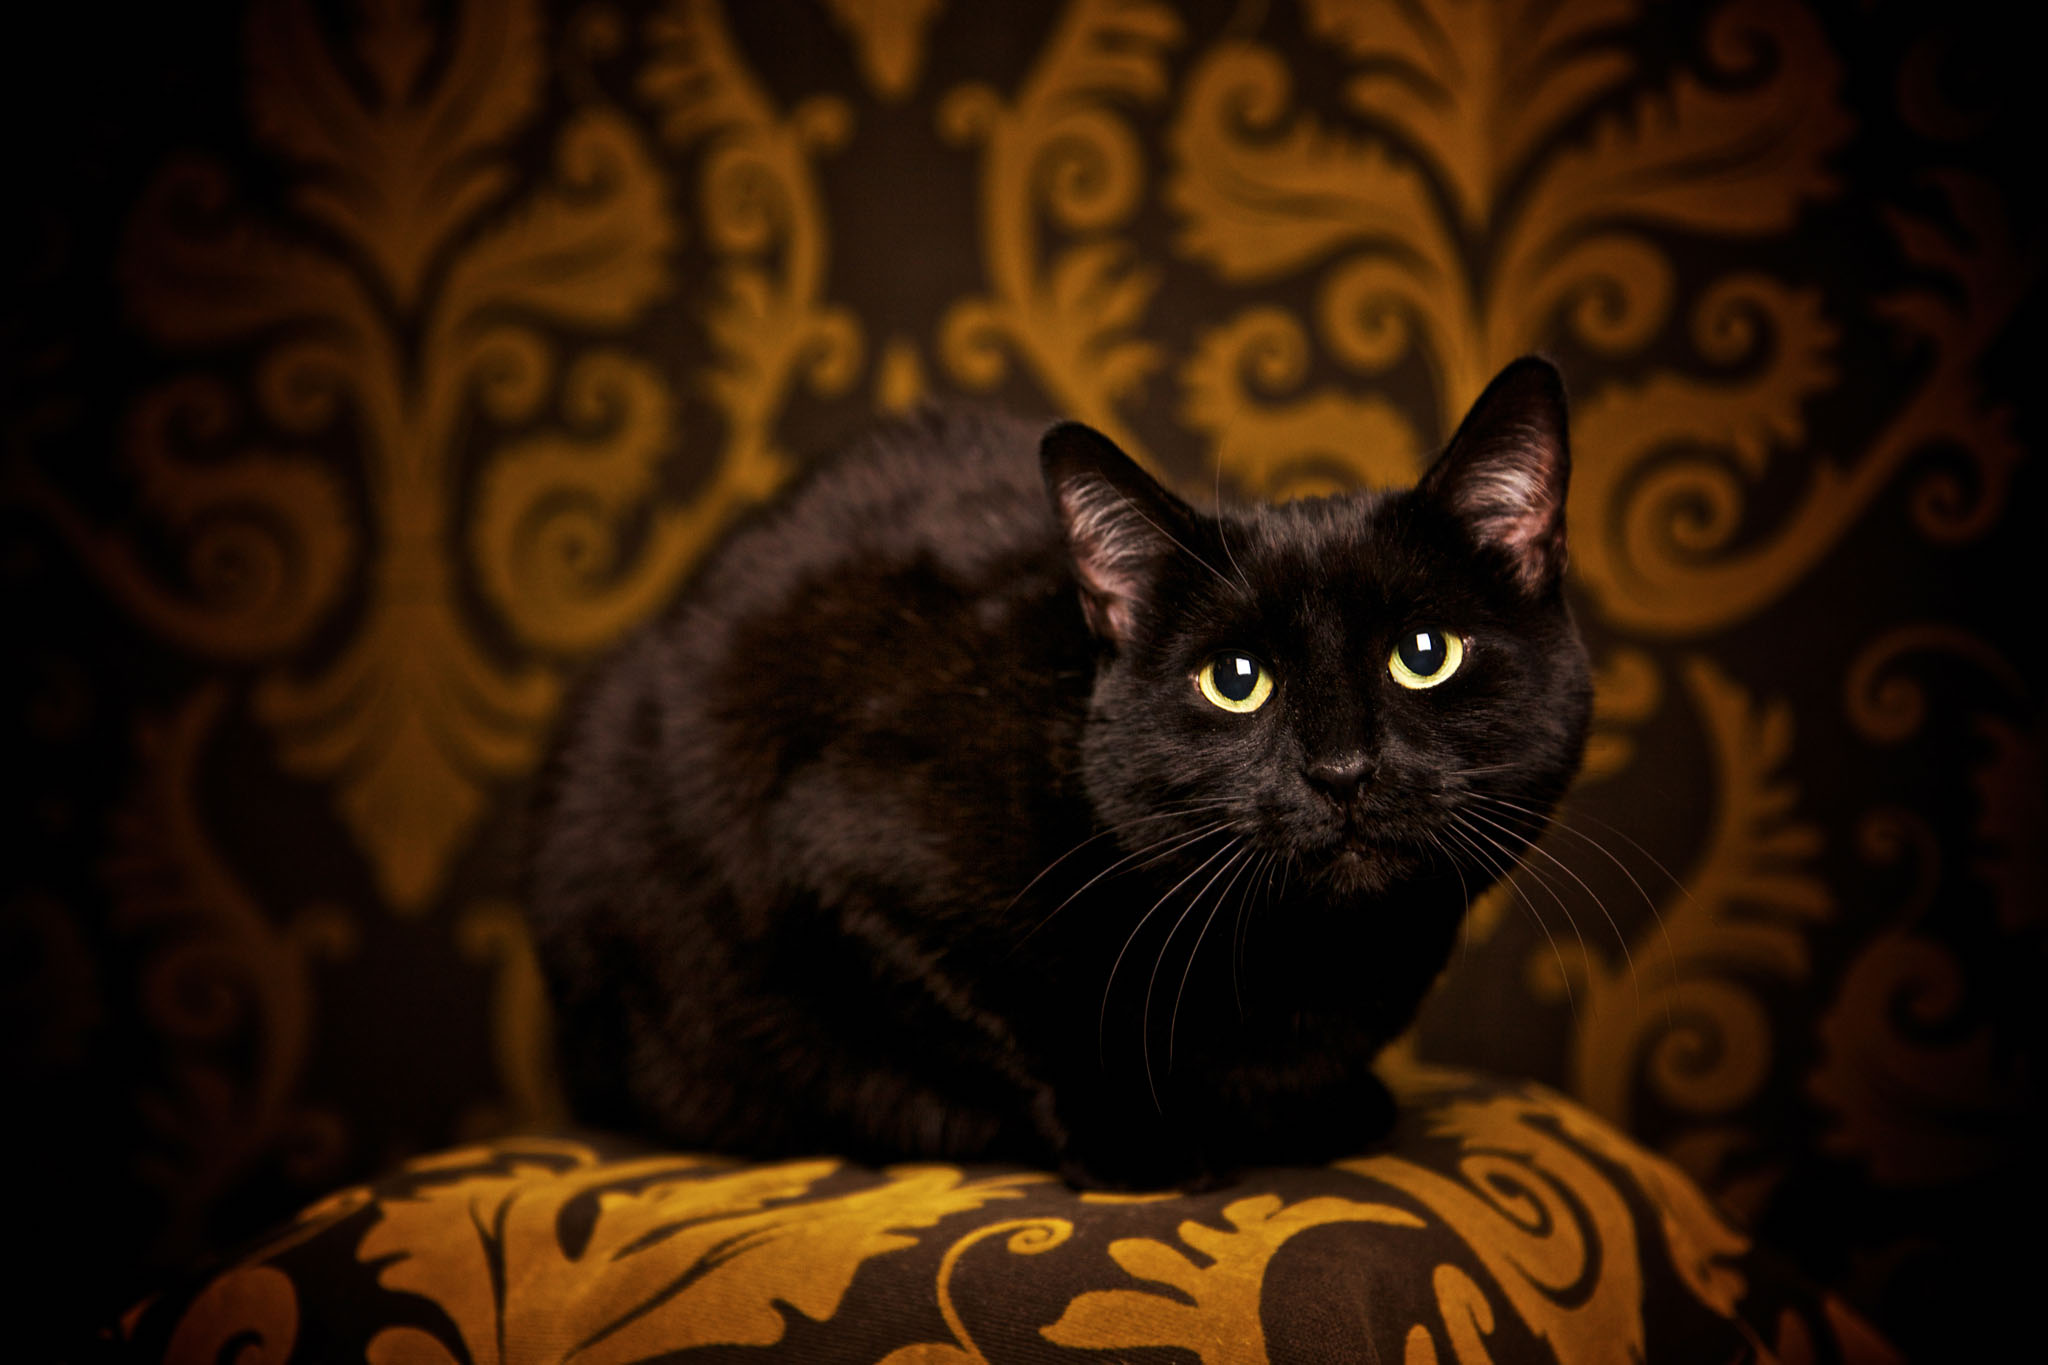 boprey-pet-photography-studio-nyc_30.jpg